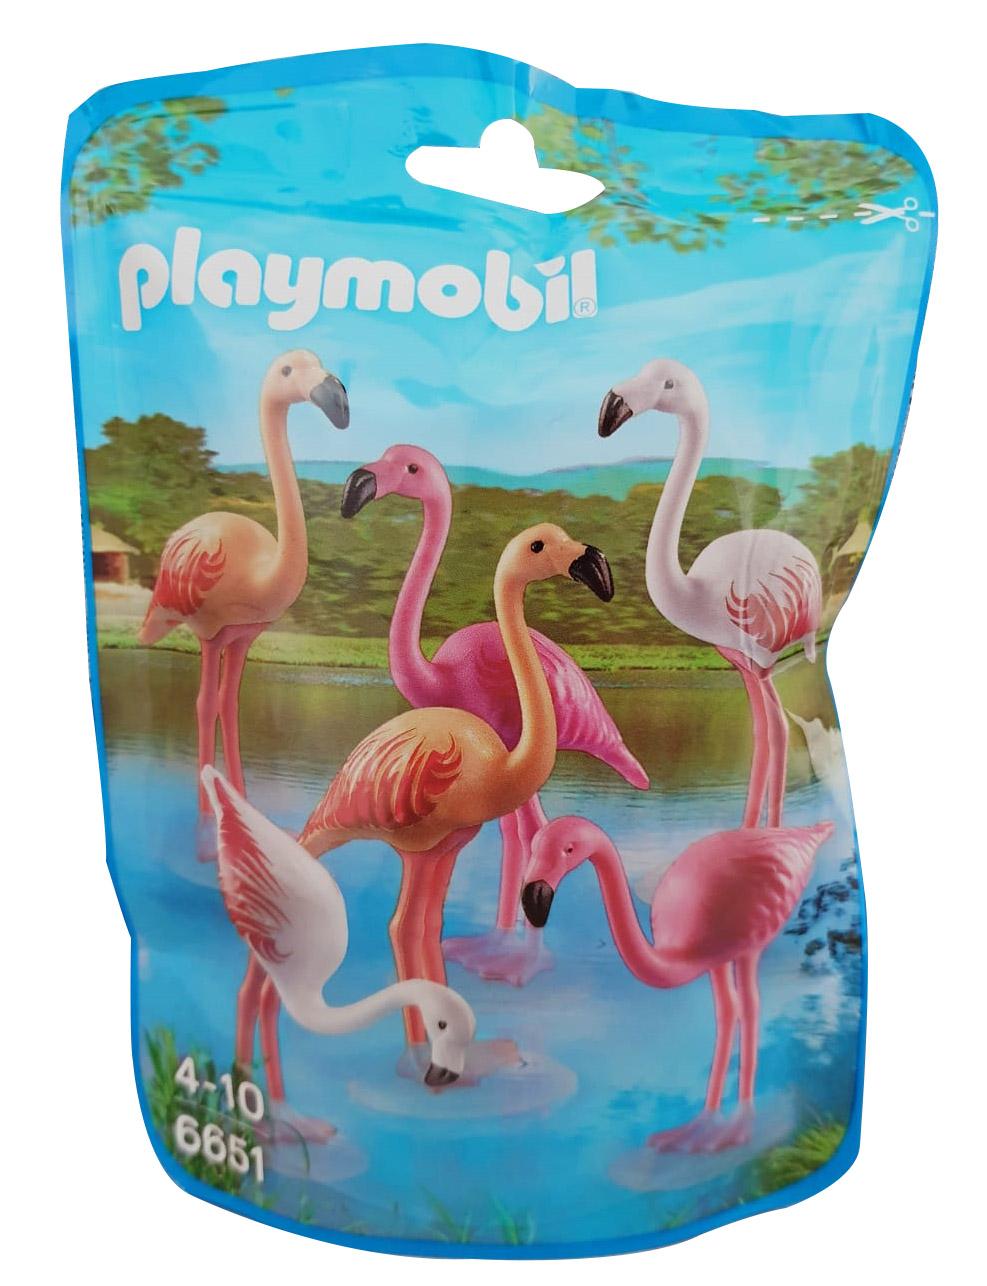 Playmobil 6651 Flamingos Familie 6 Stück Rosa Rot Weiss sehr Schöner Flamingoschwarm